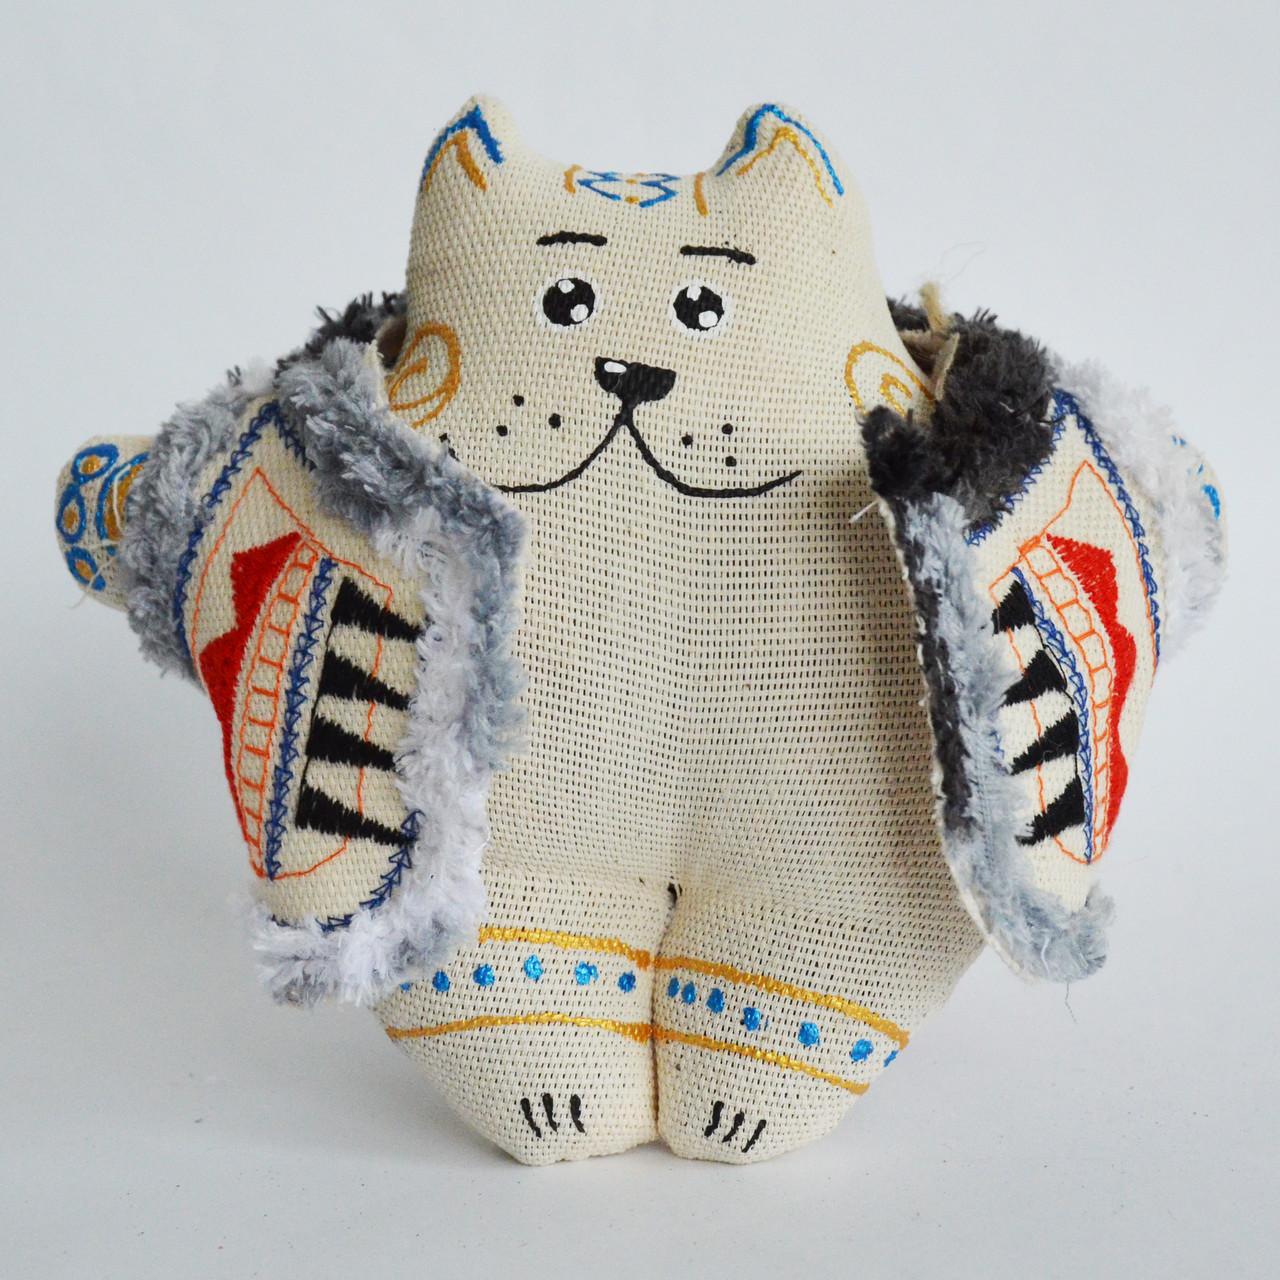 Кот талисман своими руками 471